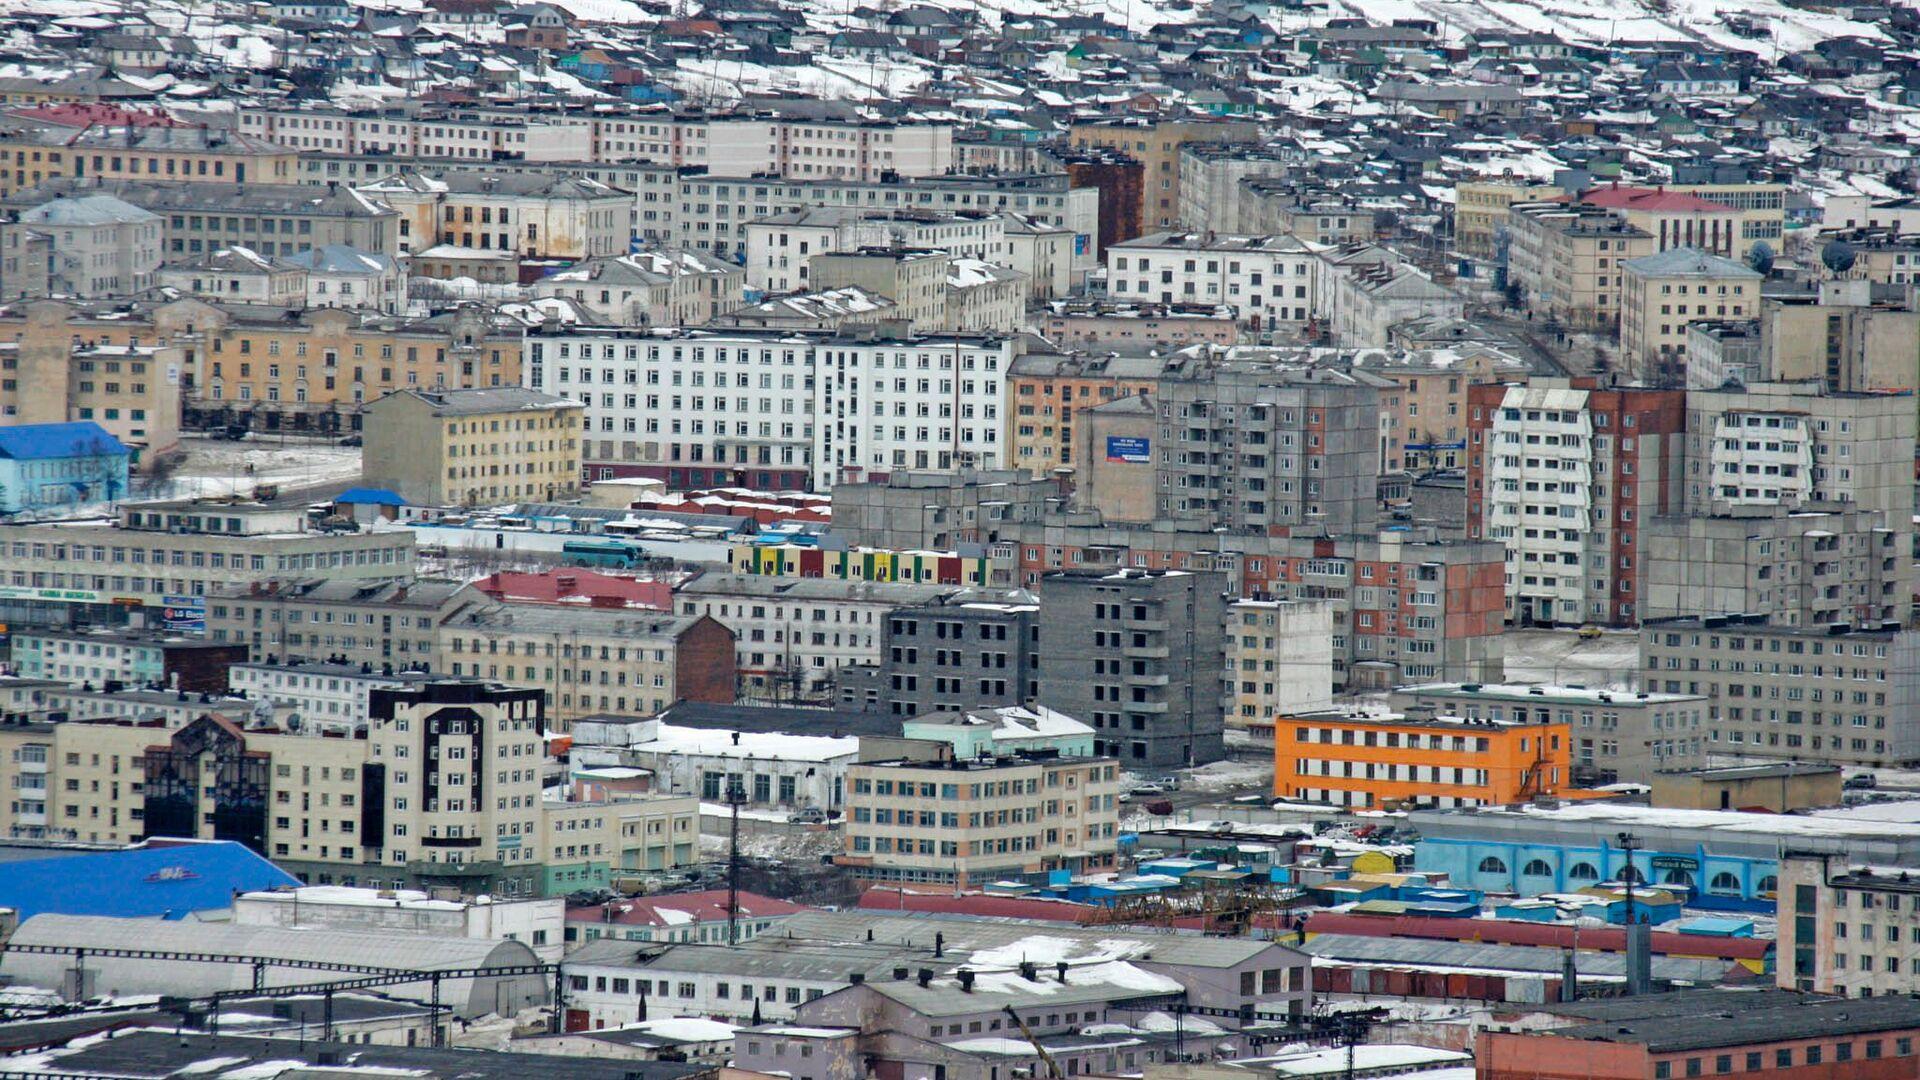 Панорама города Магадана. Архивное фото - РИА Новости, 1920, 21.09.2020